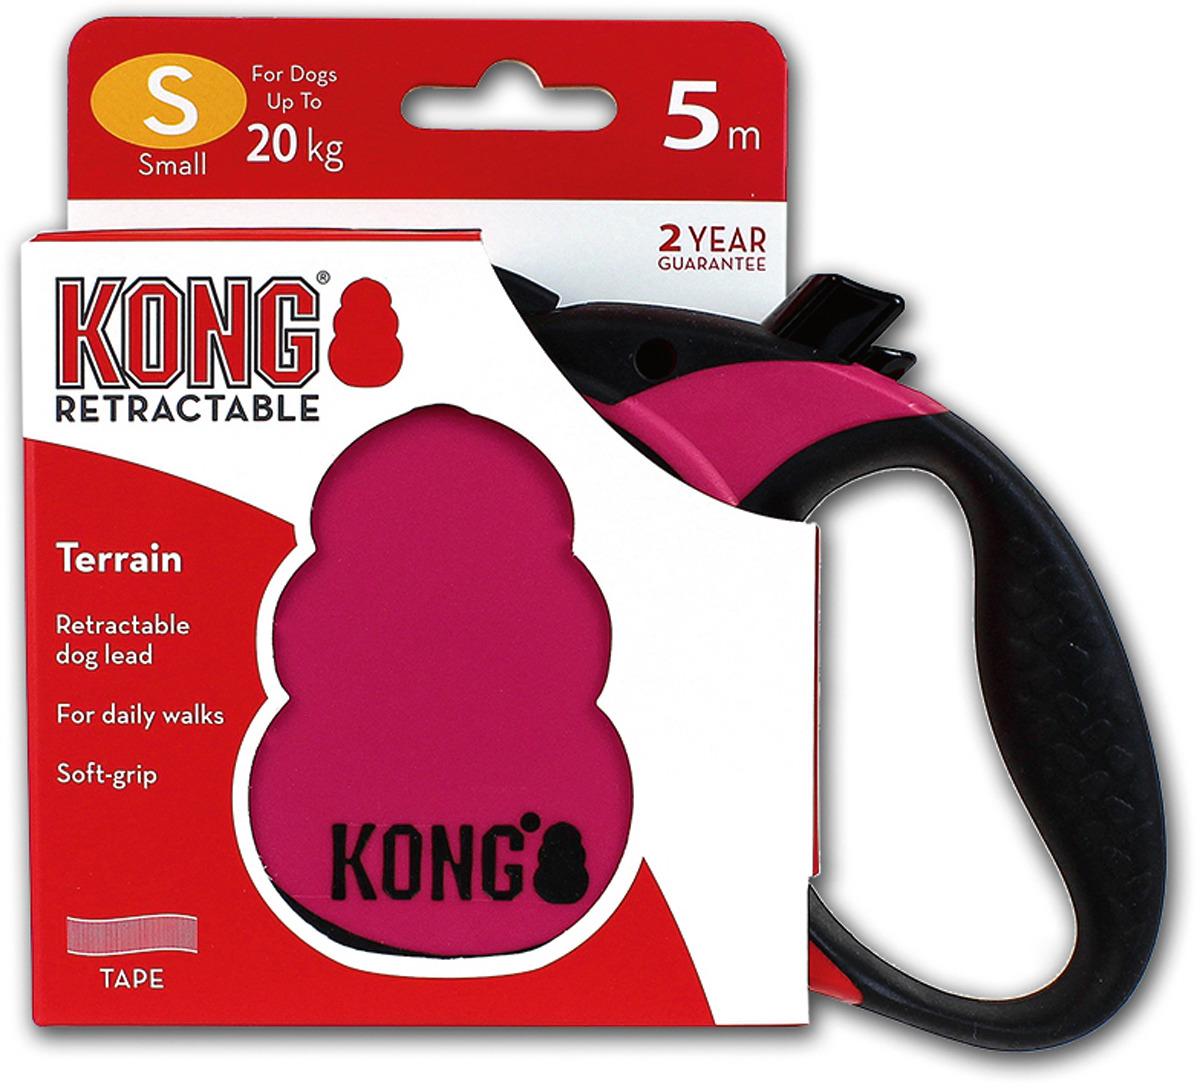 Поводок-рулетка для собак Kong Terrain S, цвет: фуксия, до 20 кг, 5 м